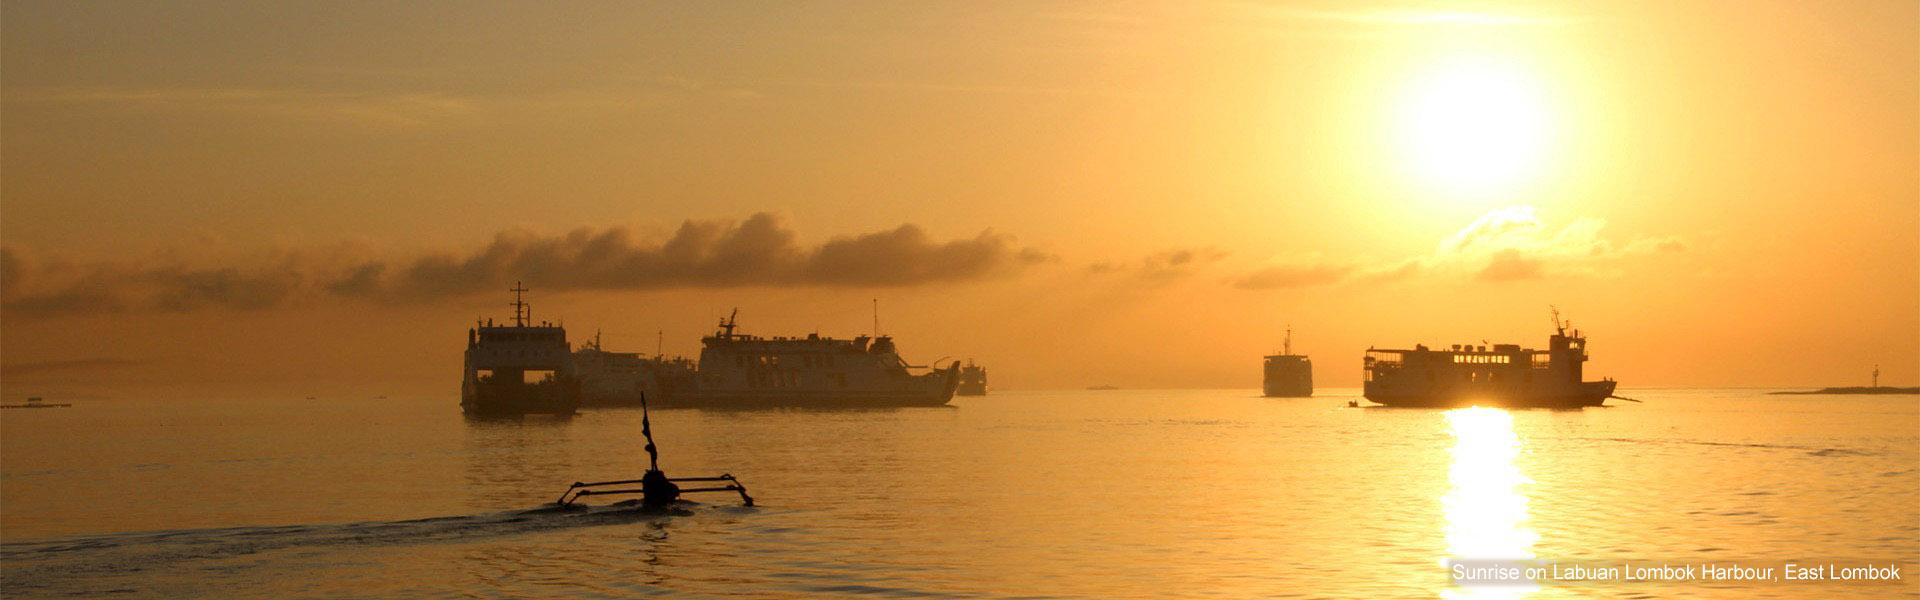 Sunrise over Labuan Lombok harbour, East Lombok